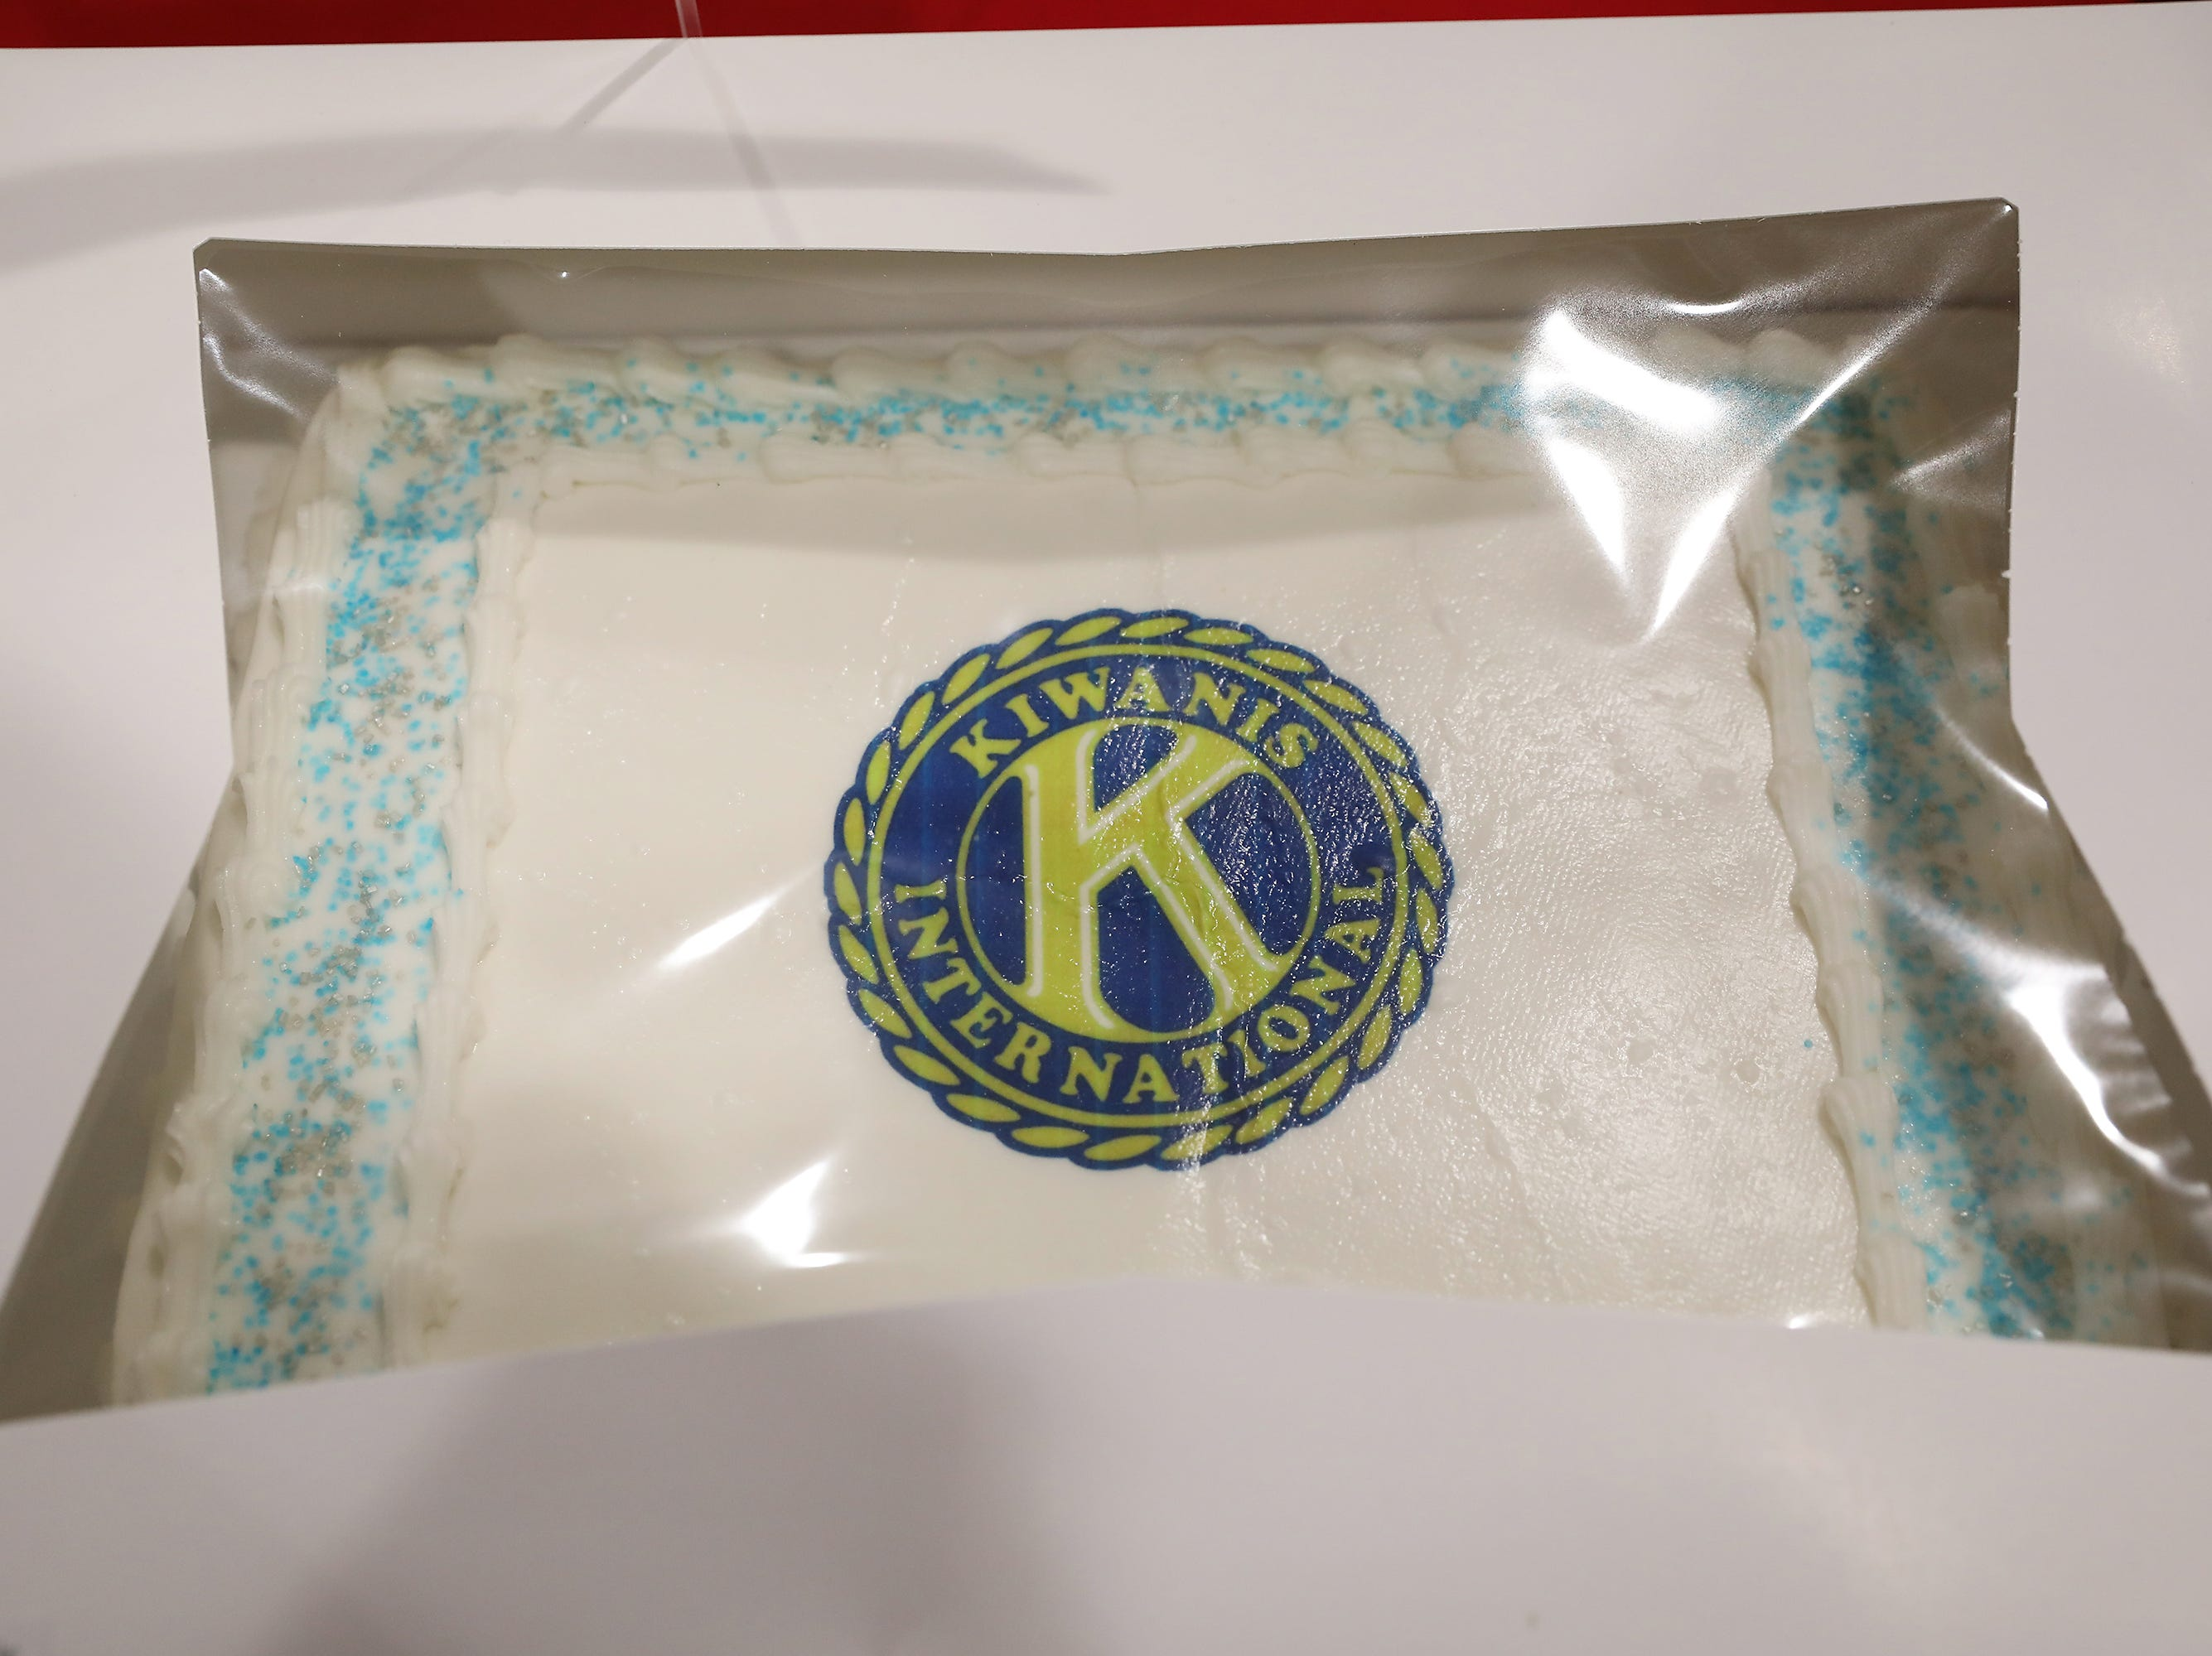 1 P.M. Friday cake 306 Kiwanis Club of Zanesville - Ohio State University golf bag